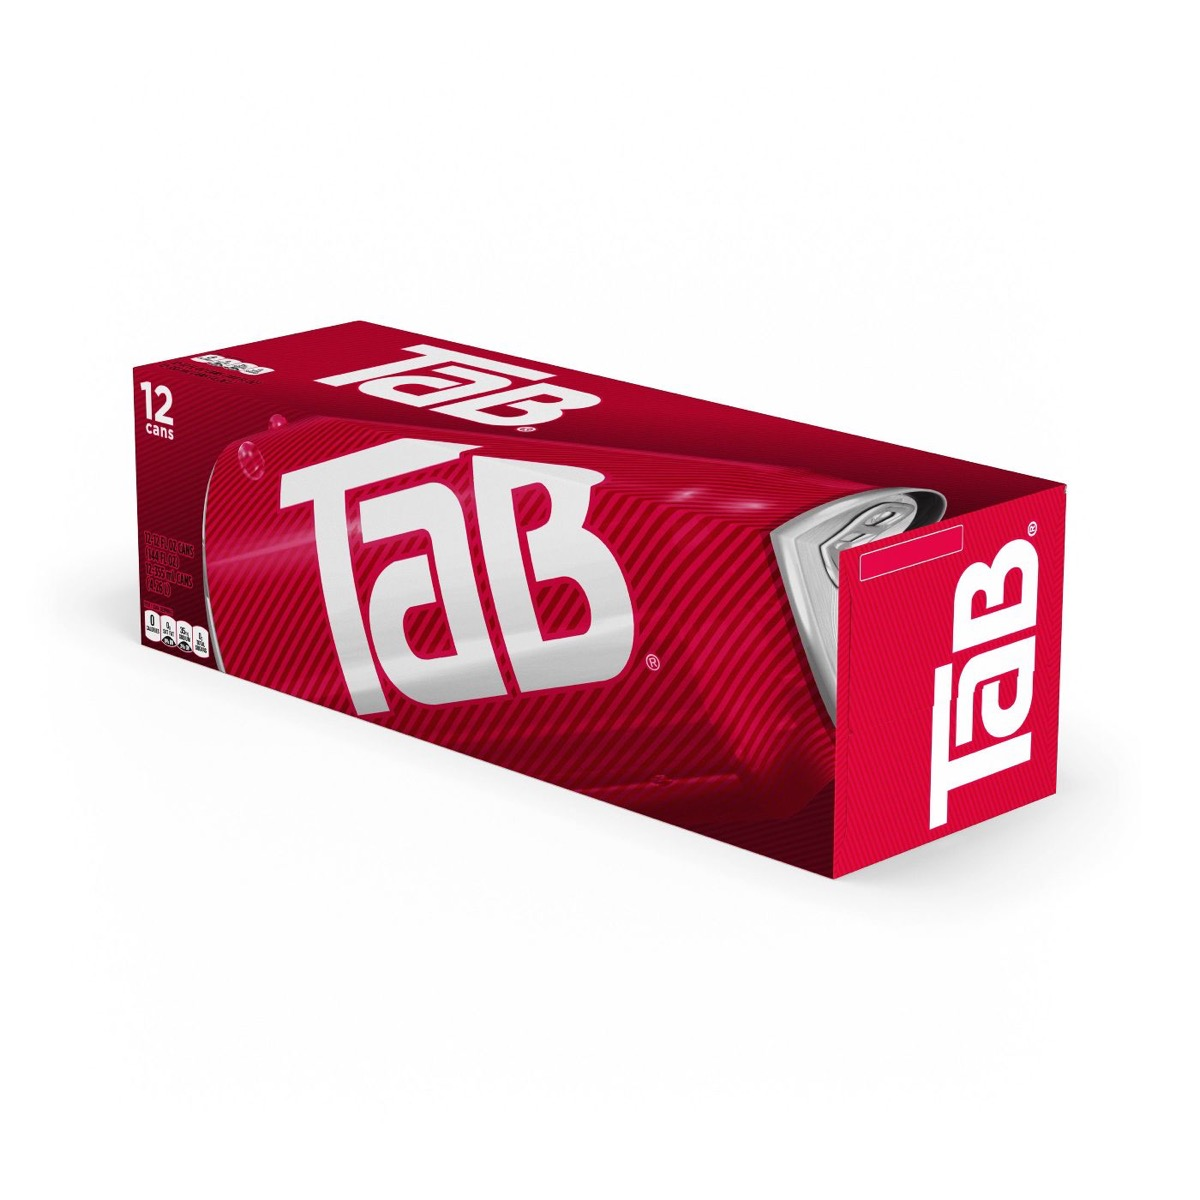 Tab soda can box